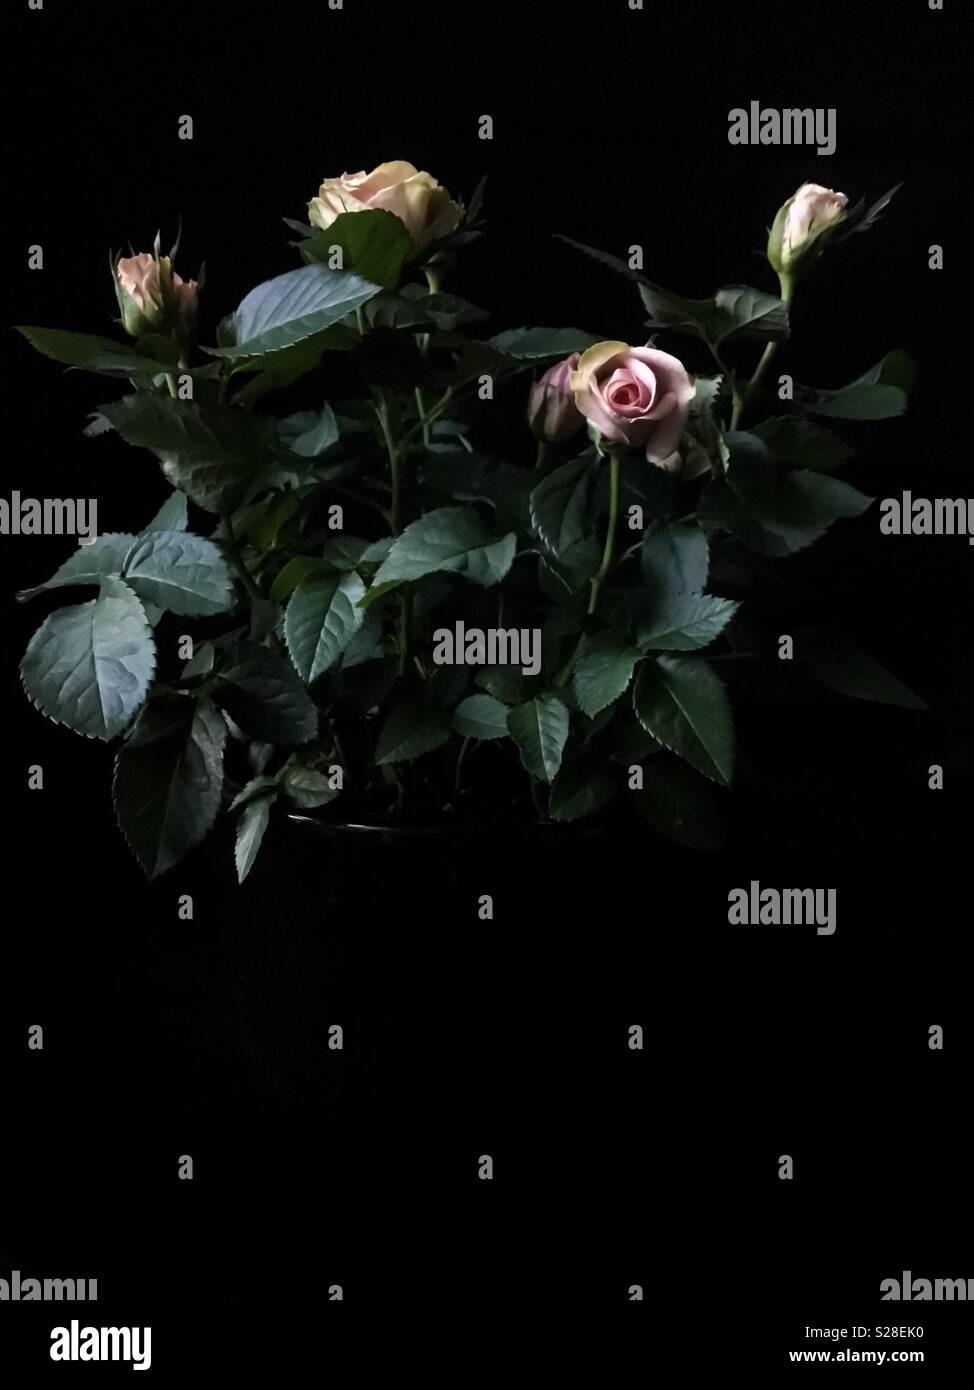 Rosa Rose Bush auf dunklem Hintergrund Stockbild